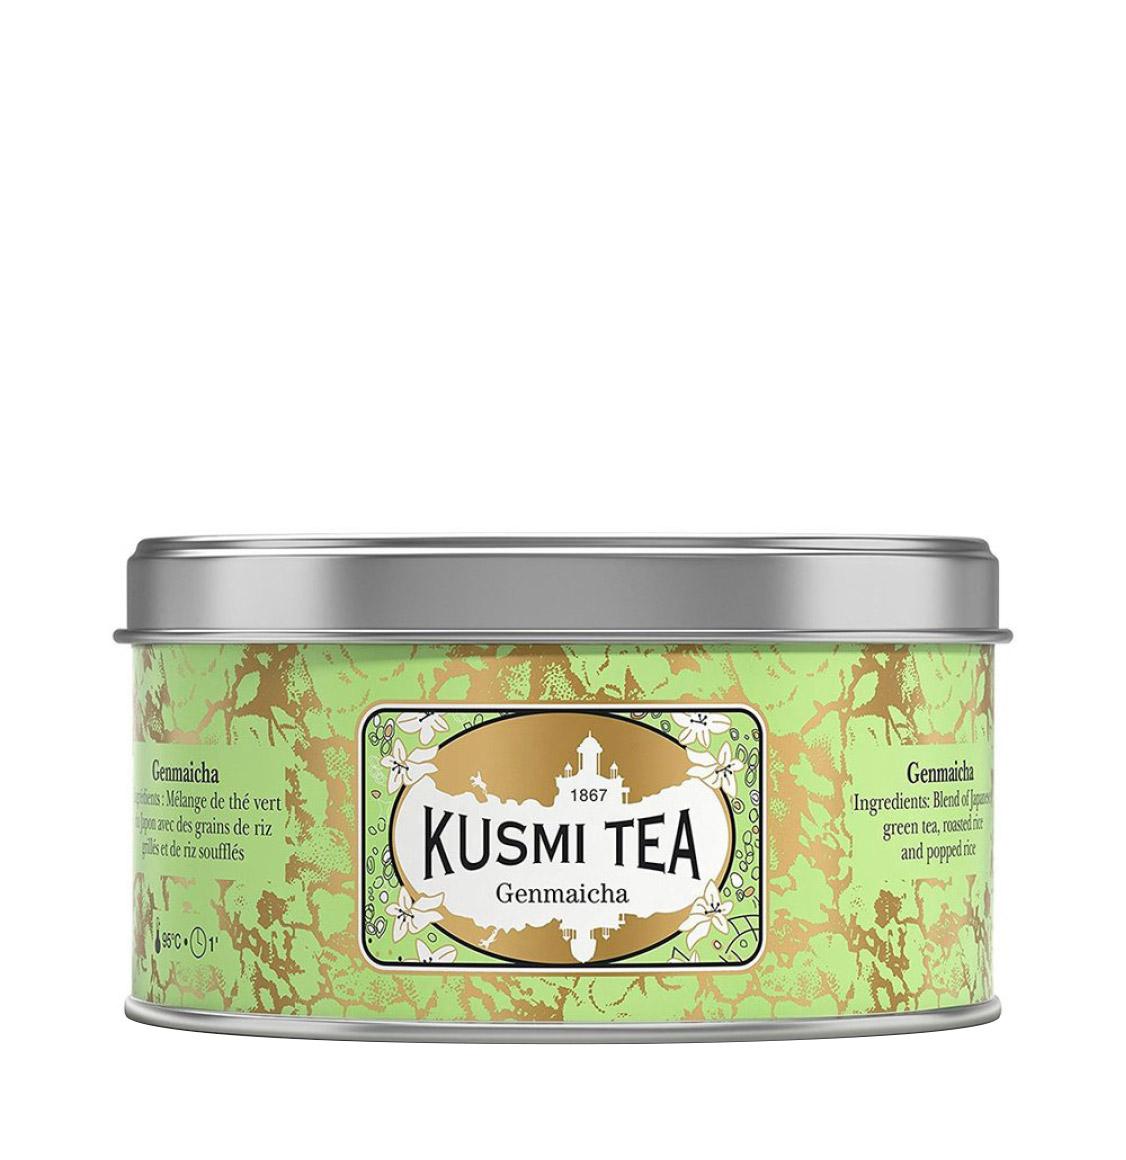 Kusmi Tea Genmaicha 100g